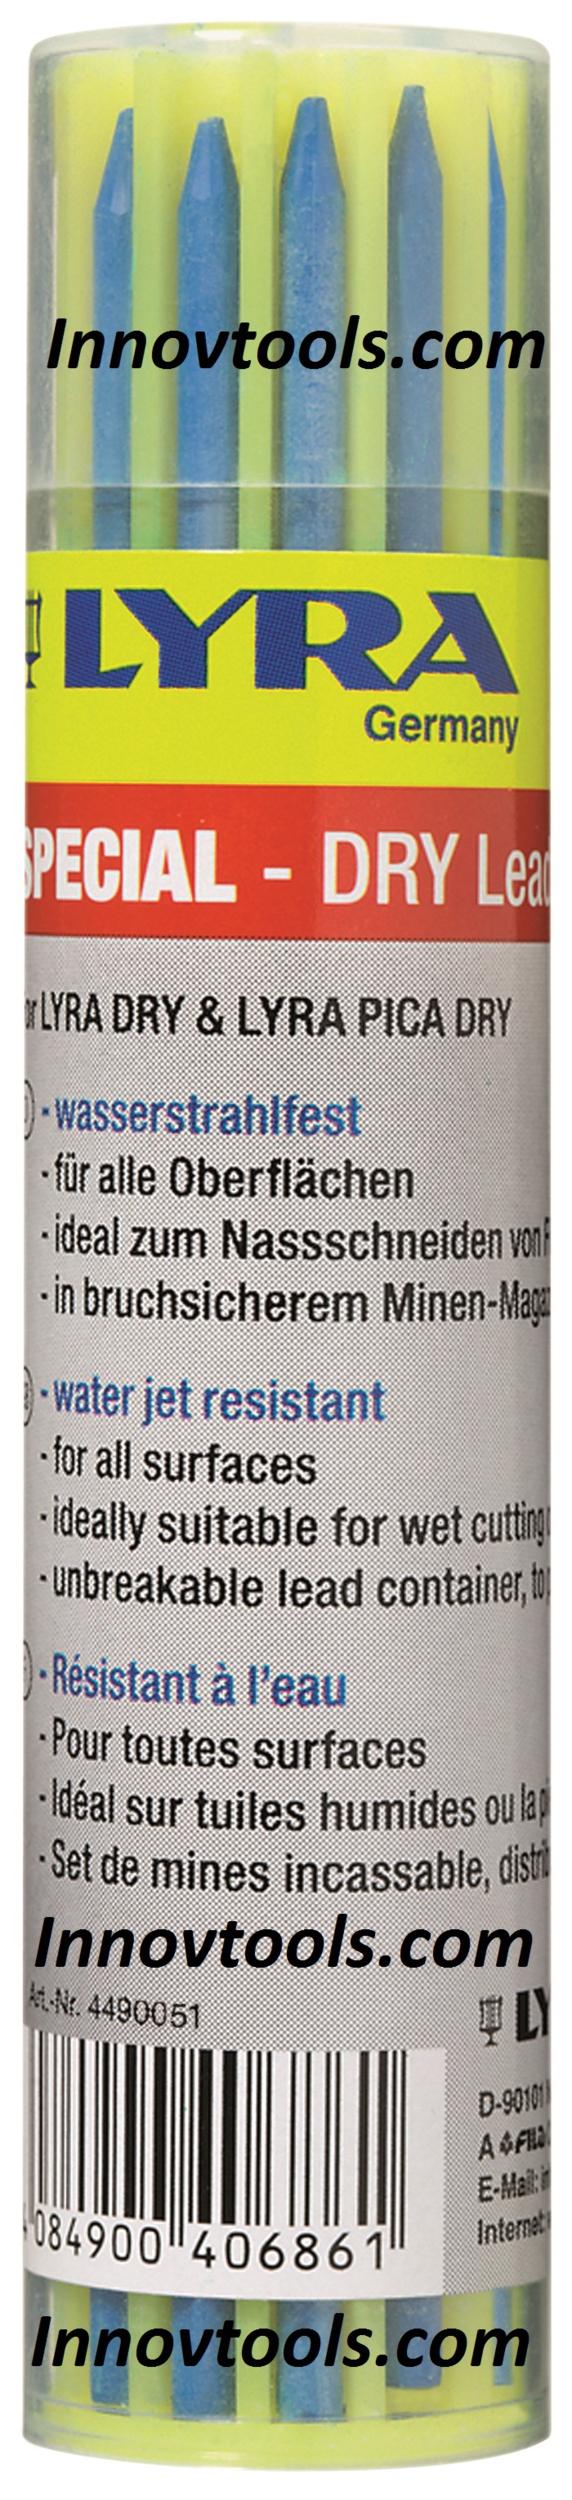 Recharge de 12 Mines LYRA DRY Bleues | 4490051